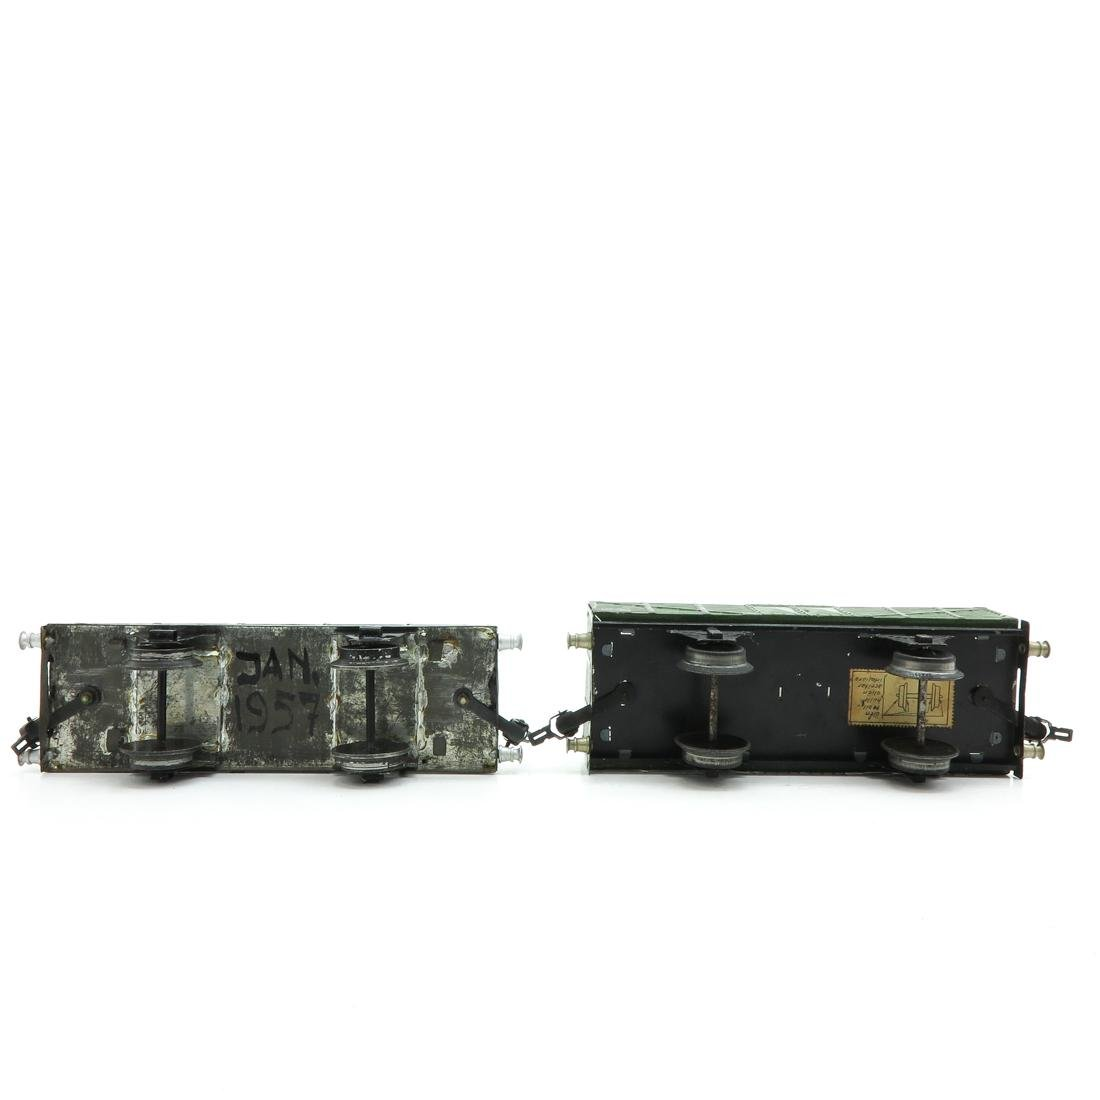 Lot of 2 Vintage Marklin Wagons - 6